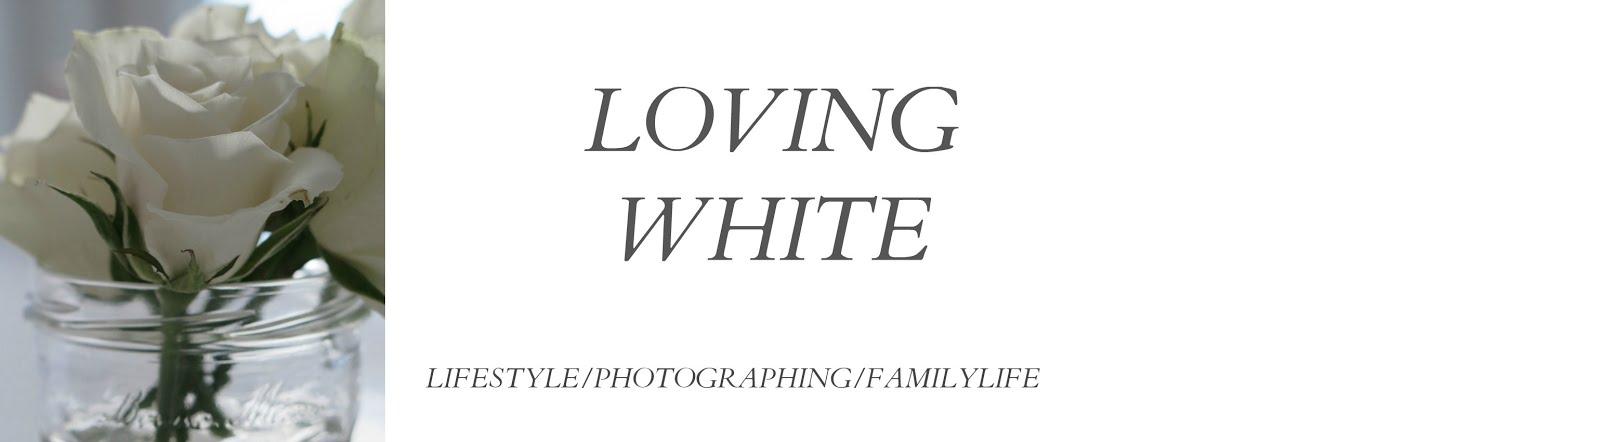 loving white